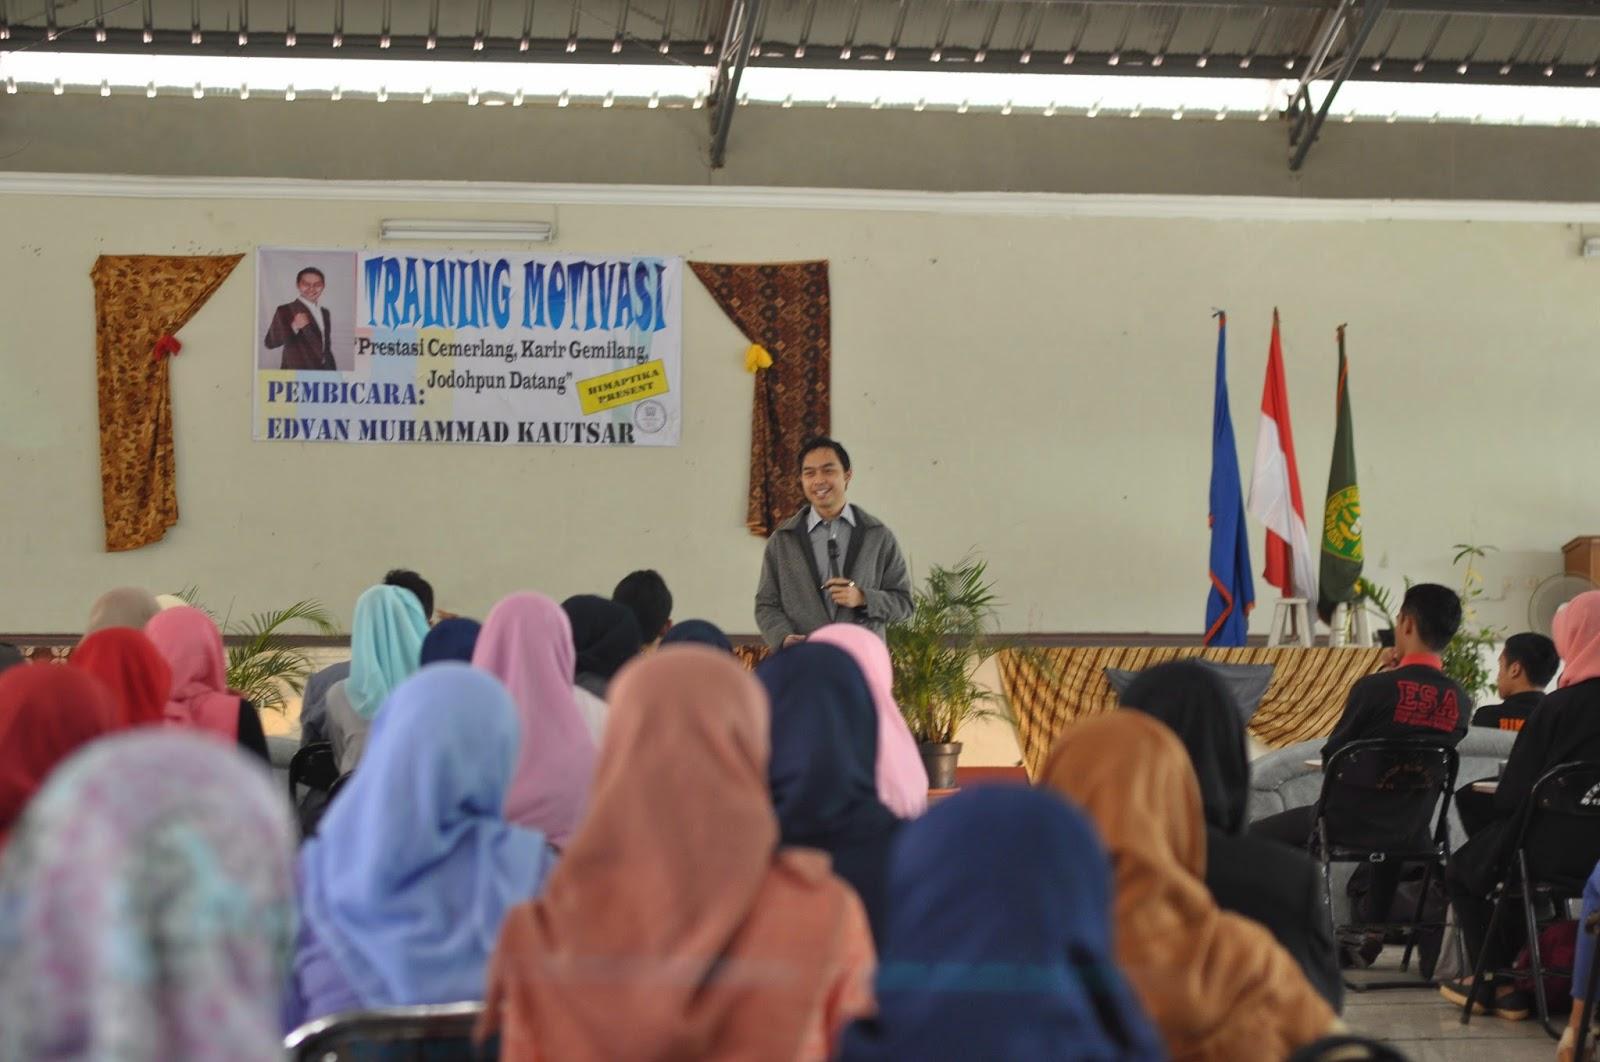 motivator muda, pembicara seminar, motivator indonesia, motivator terbaik, penulis buku, seminar motivasi, training motivasi, pembicara muda, pengusaha muda, sukses muda, edvan m kautsar